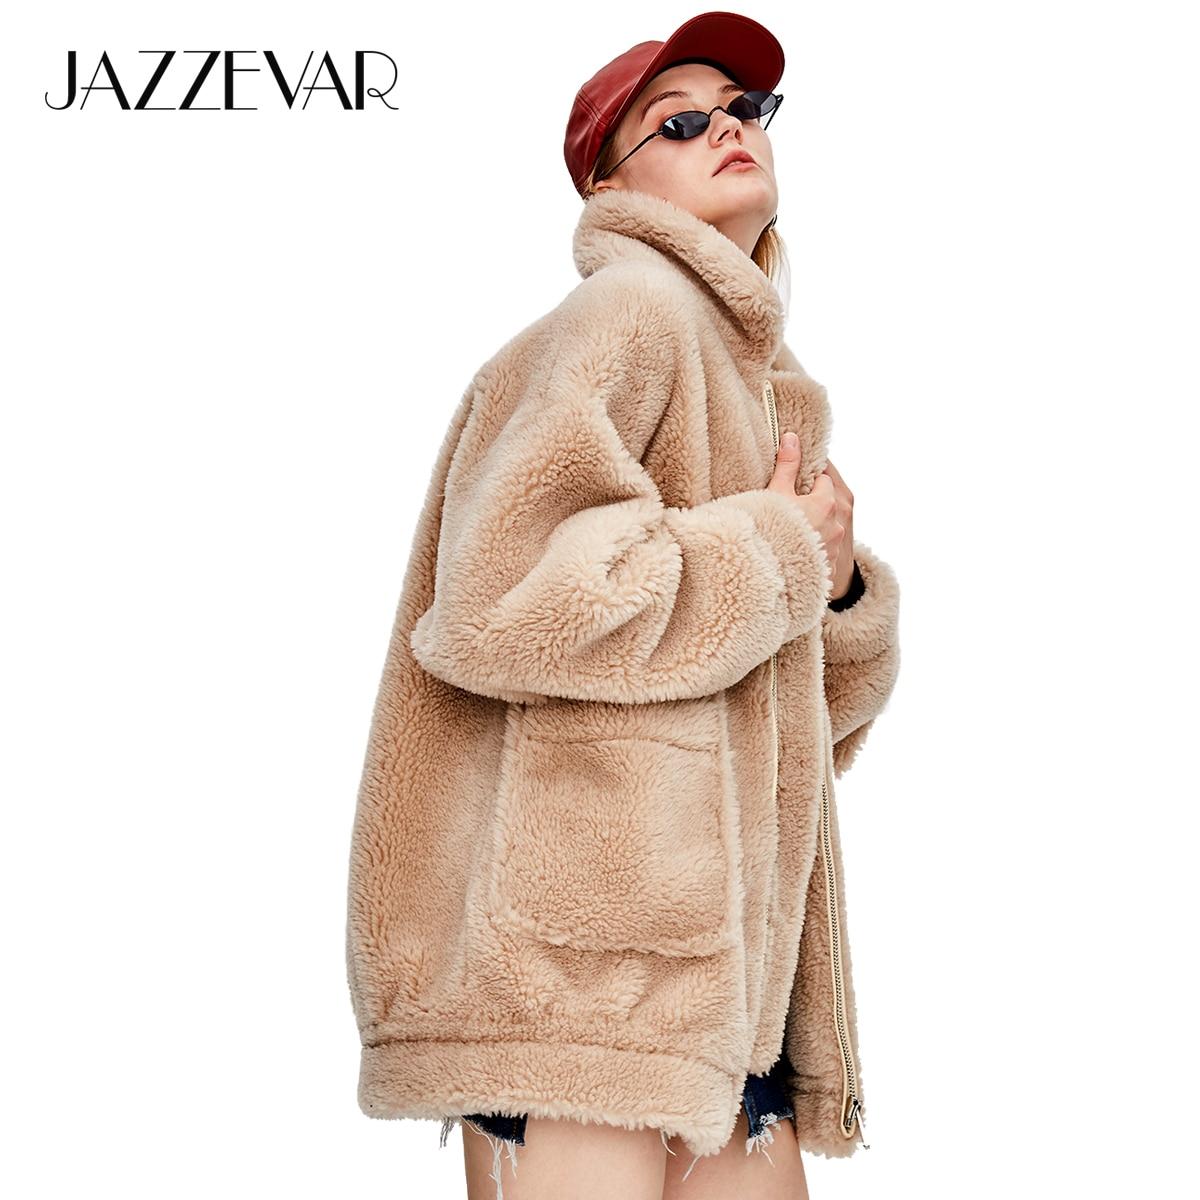 JAZZEVAR Winter Fashion Teddy Bear Coat JE7768